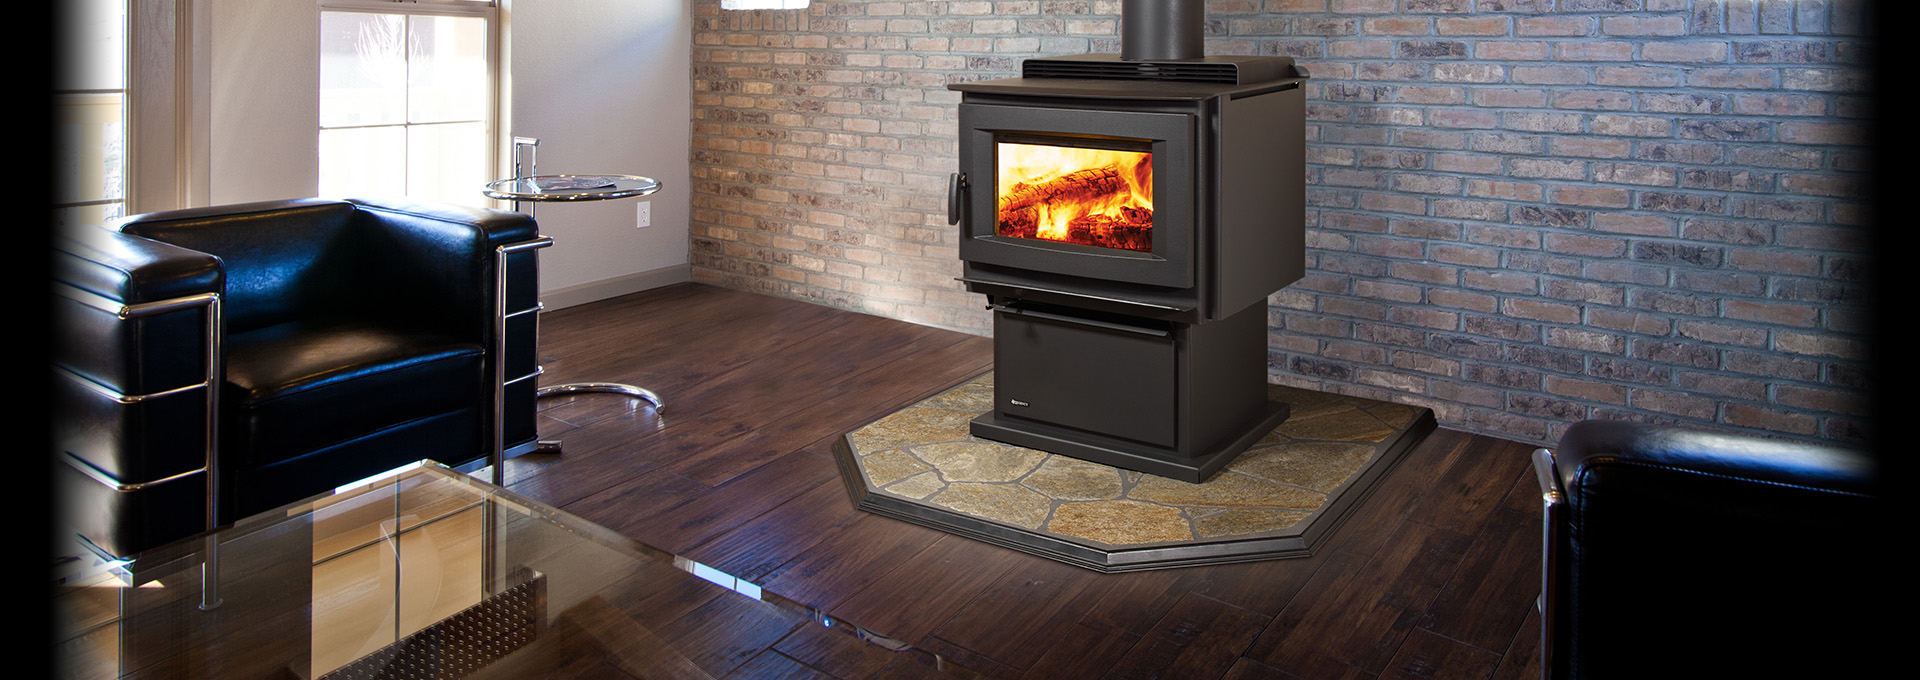 Regency Pro Series Extra Large Wood Stove